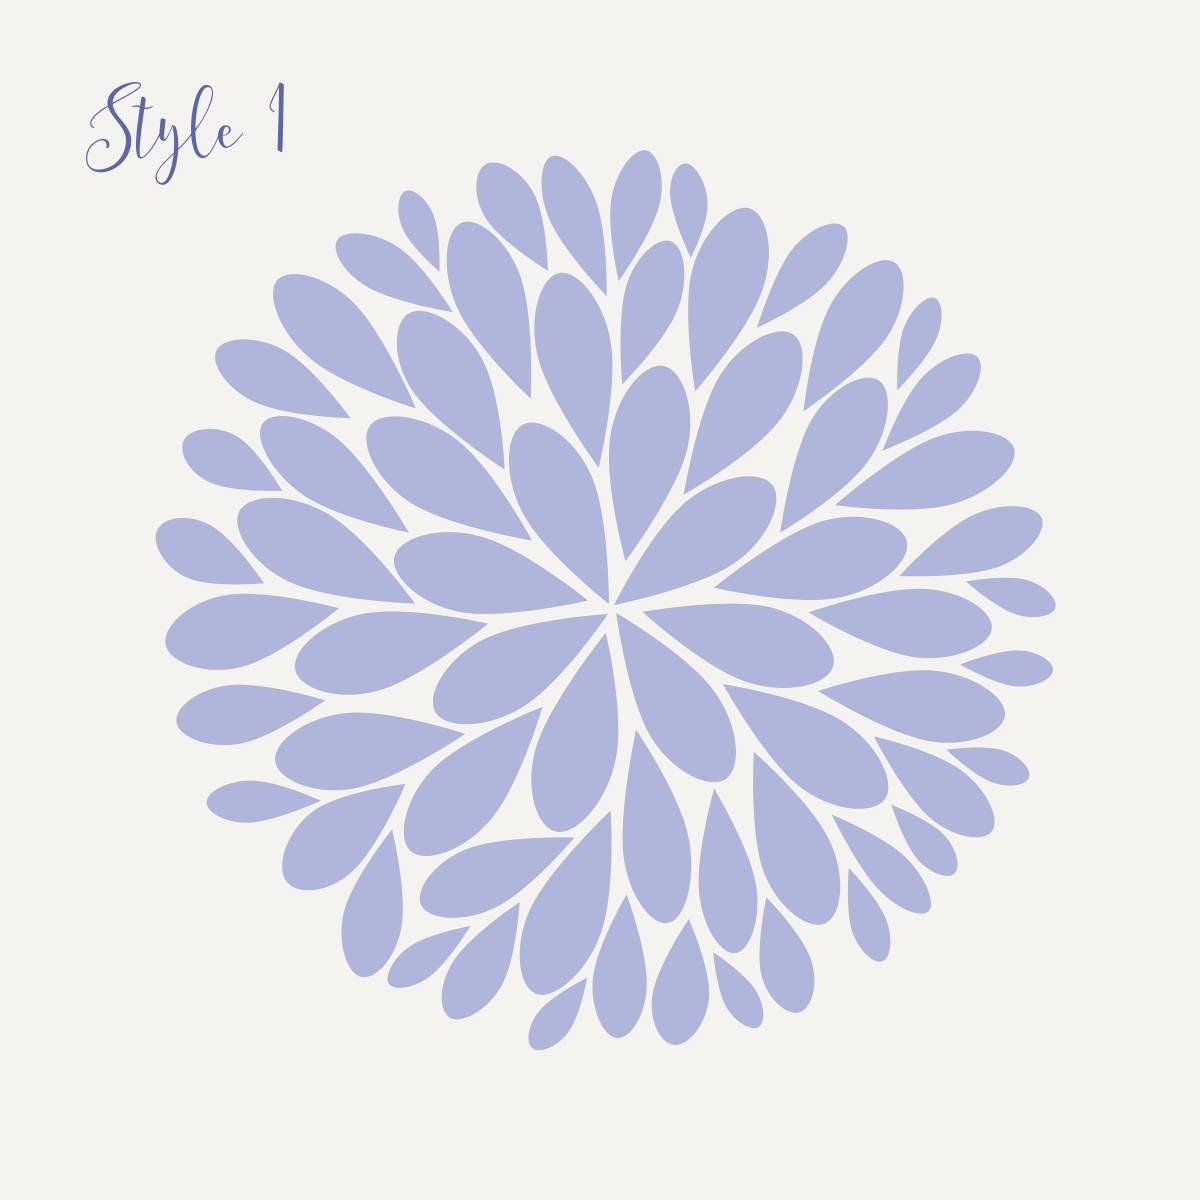 Single Dahlia Flower Vinyl Decal | Big Dahlia Flower Wall Decal | Dahlia Decal Three Size Options  sc 1 th 225 & Single Dahlia Flower Vinyl Decal | Big Dahlia Flower Wall Decal ...